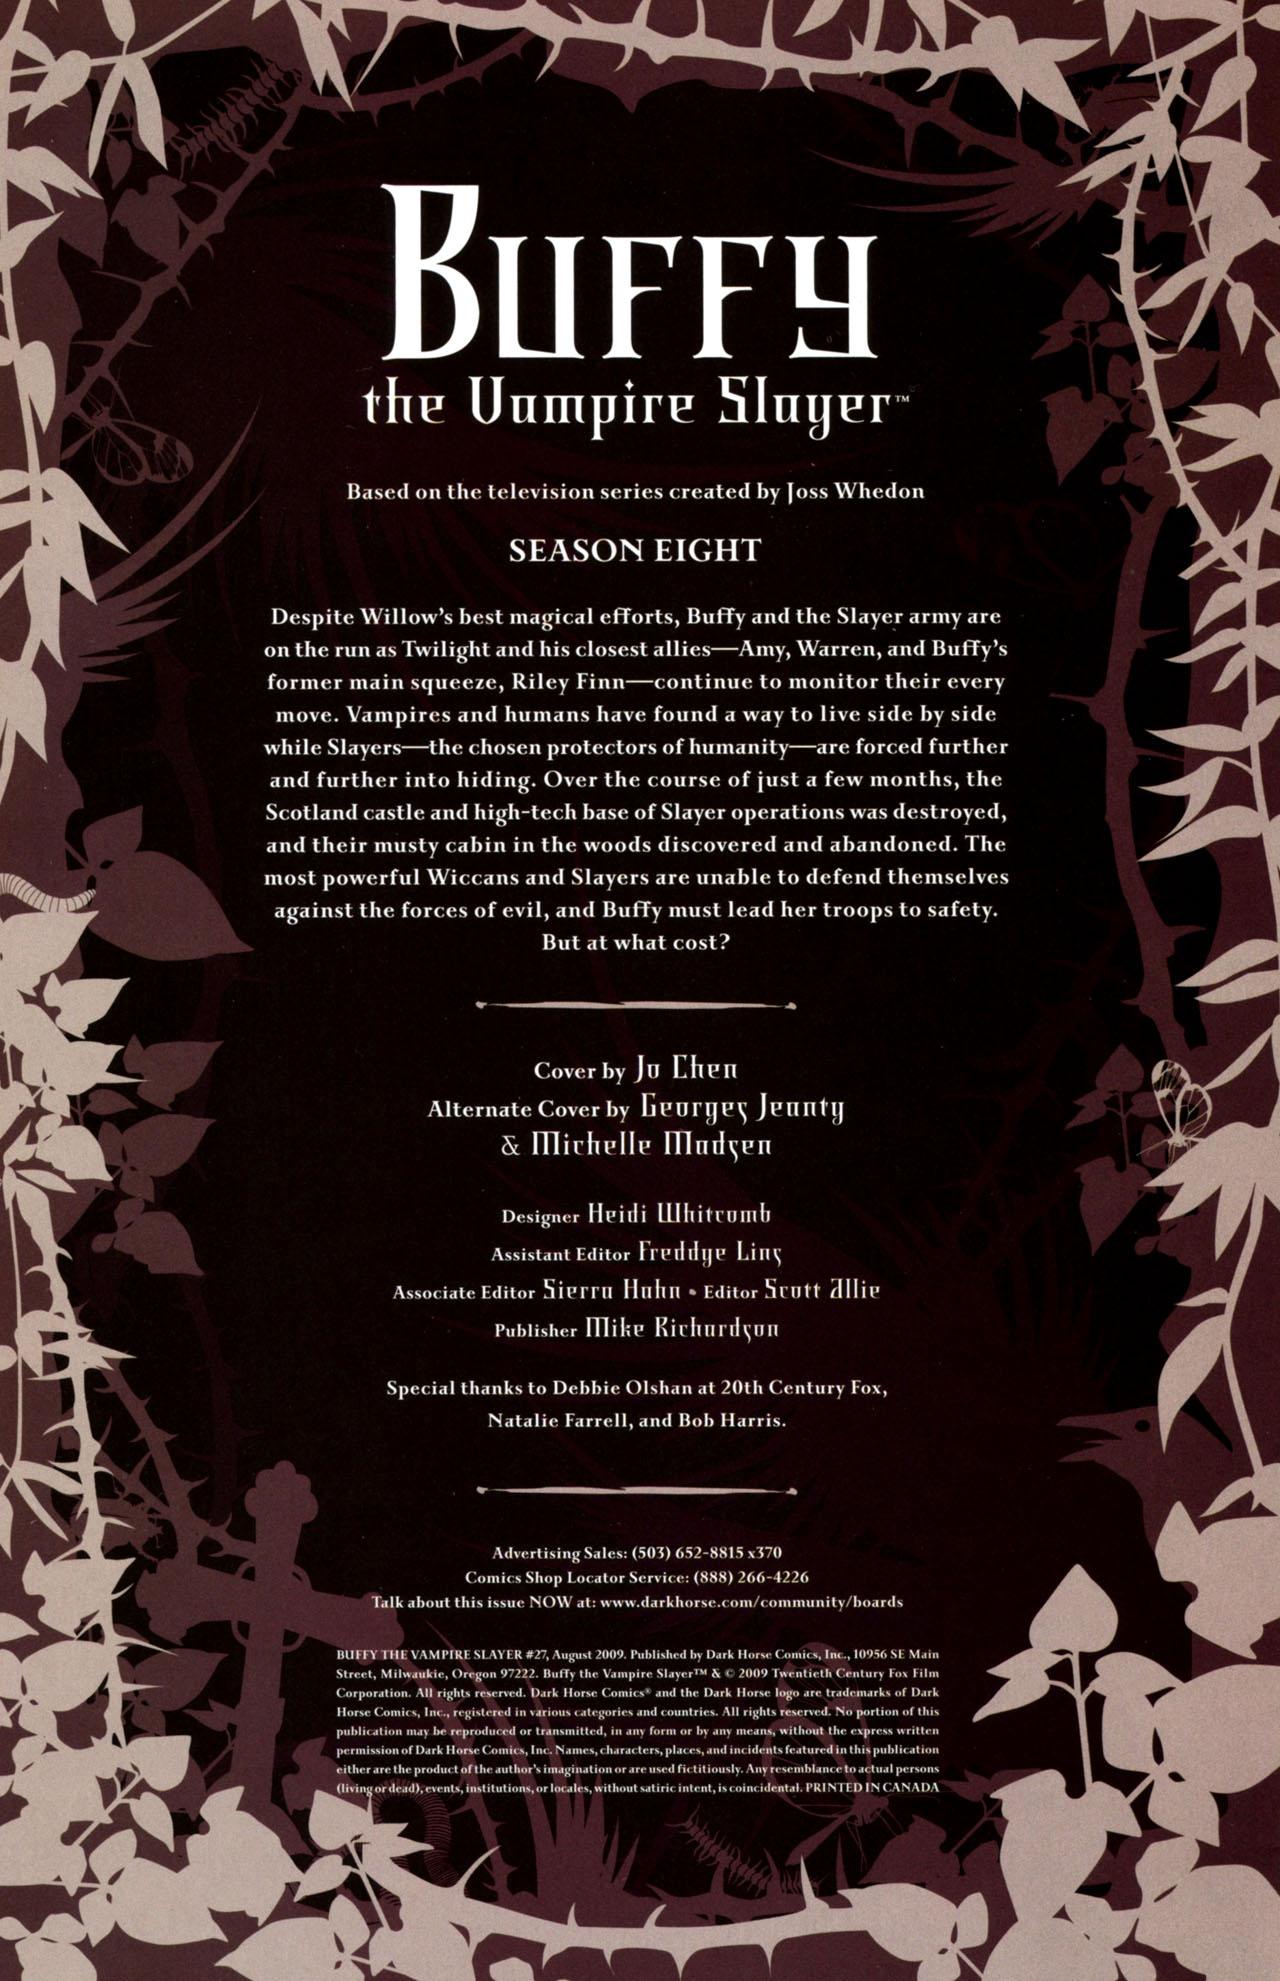 Buffy the Vampire Slayer Season Eight 27 Page 2